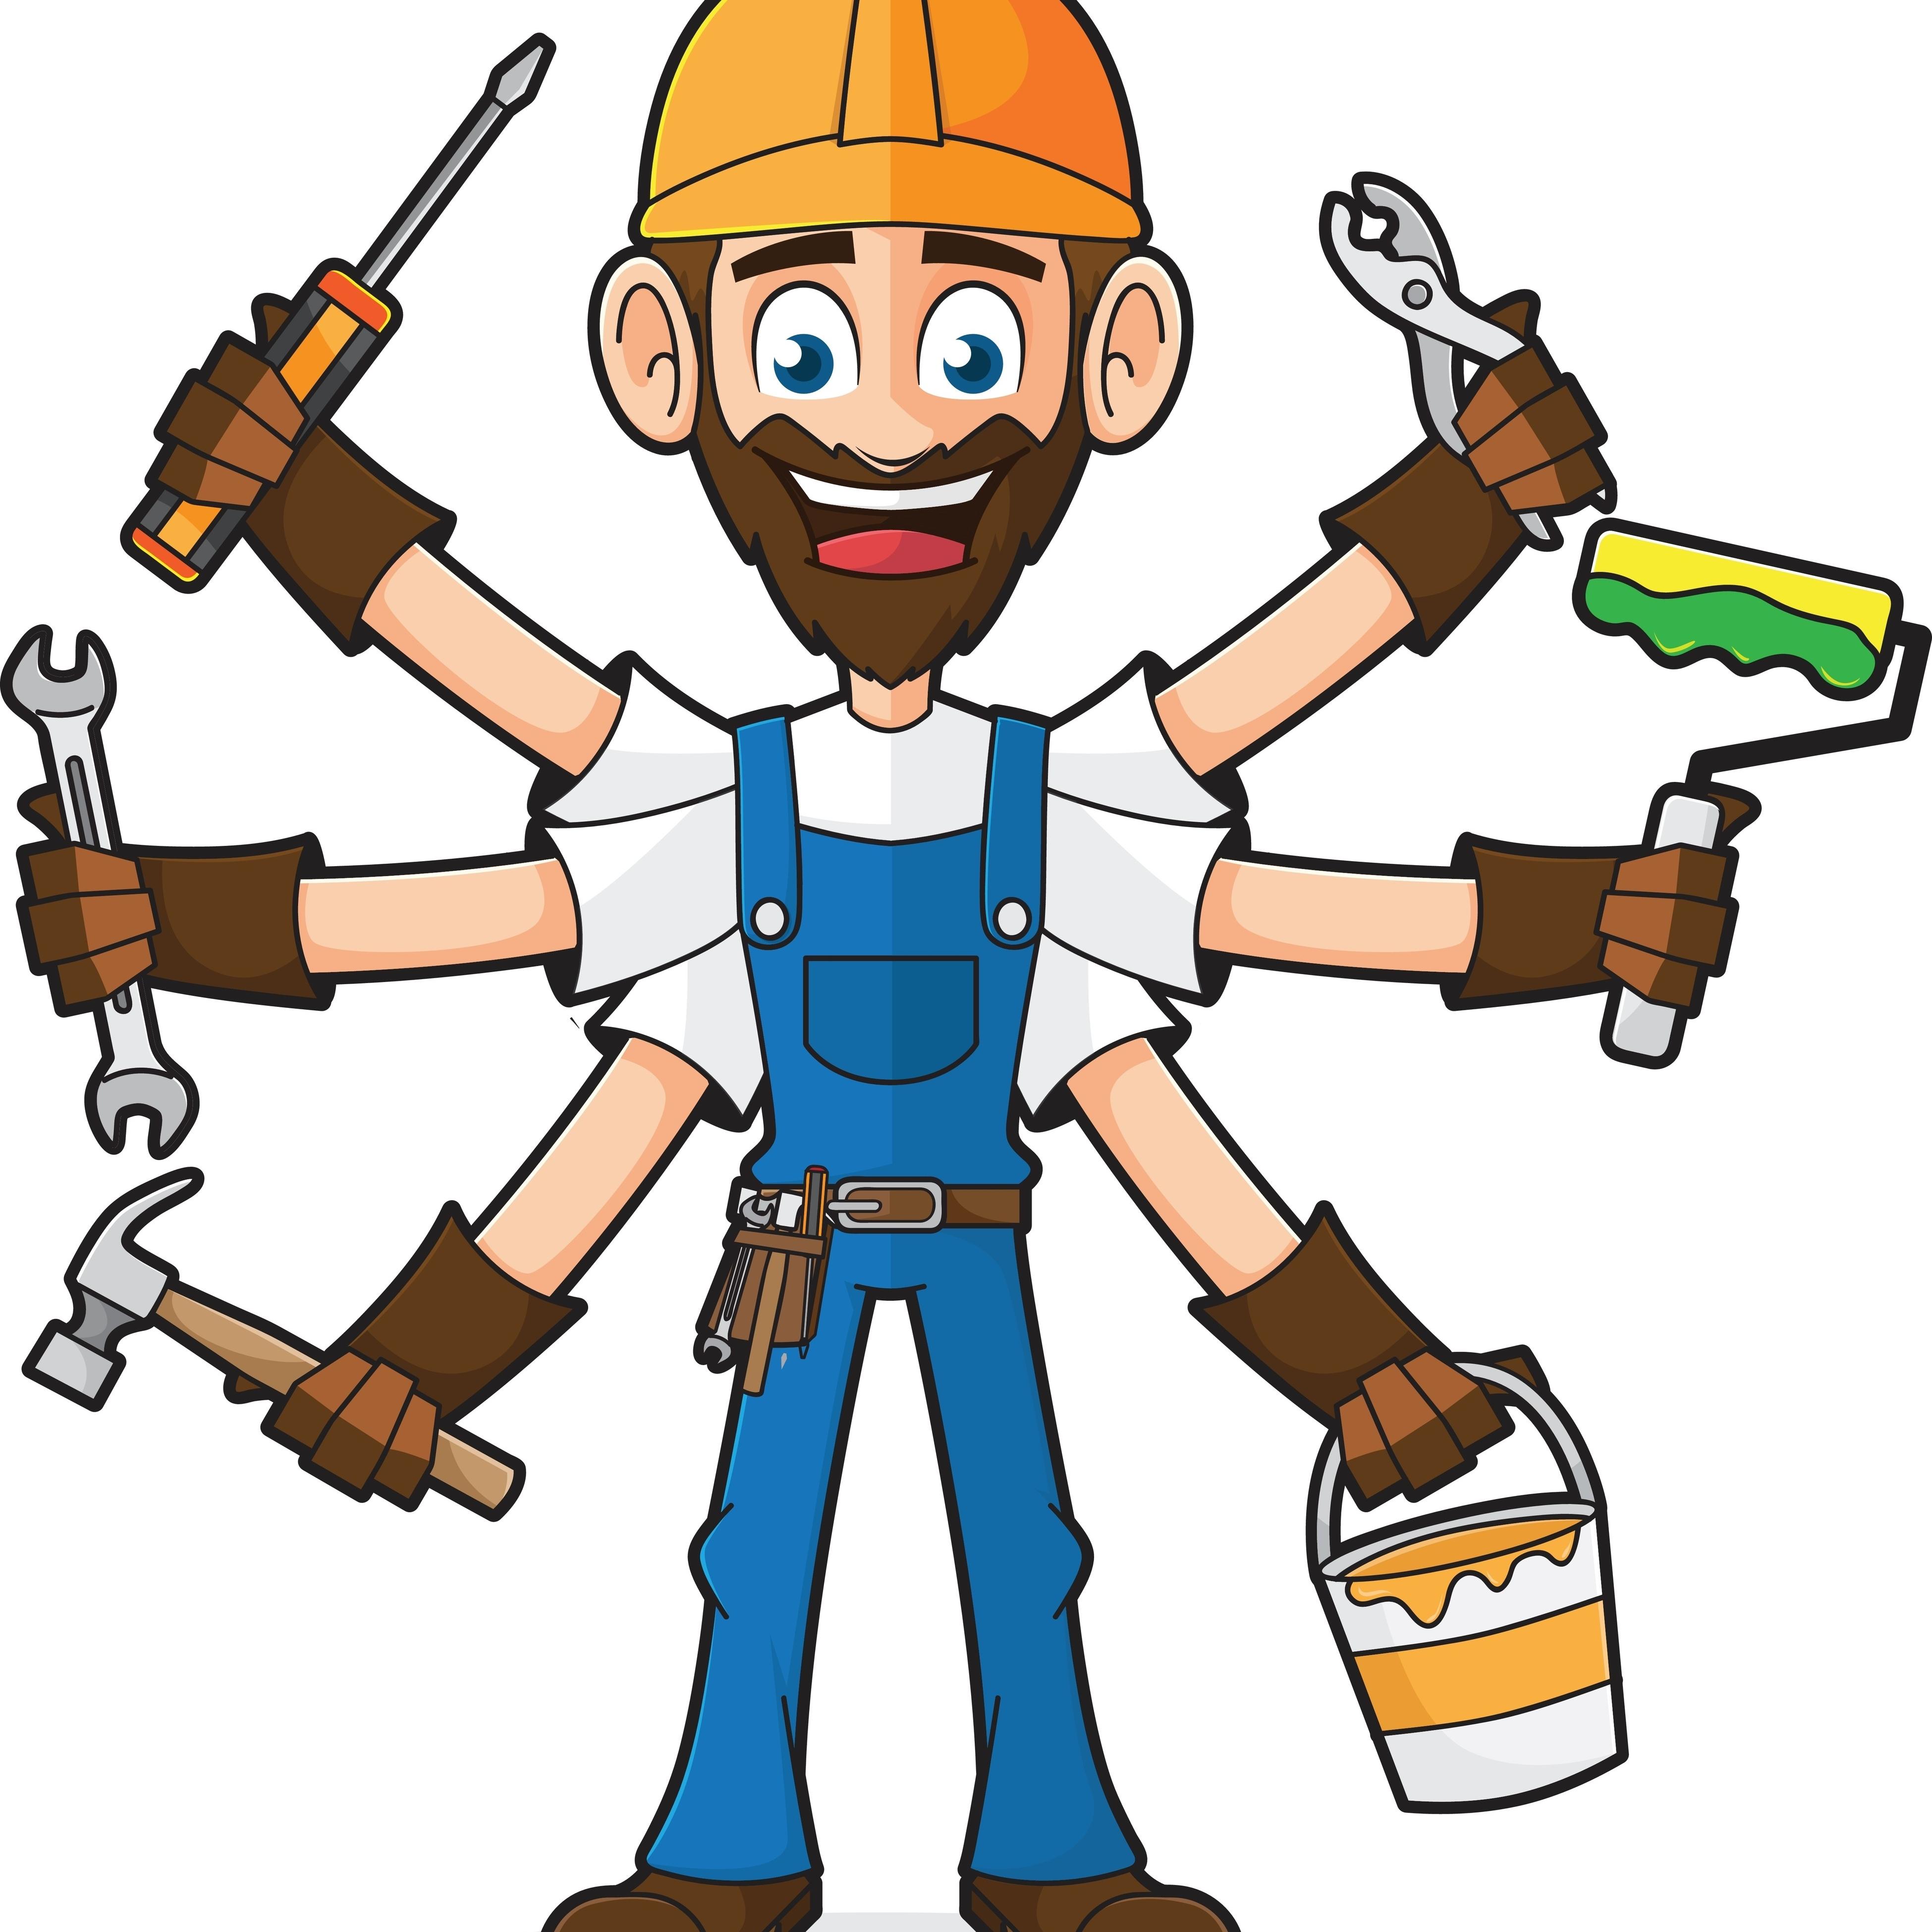 Hank's Painting & handyman service